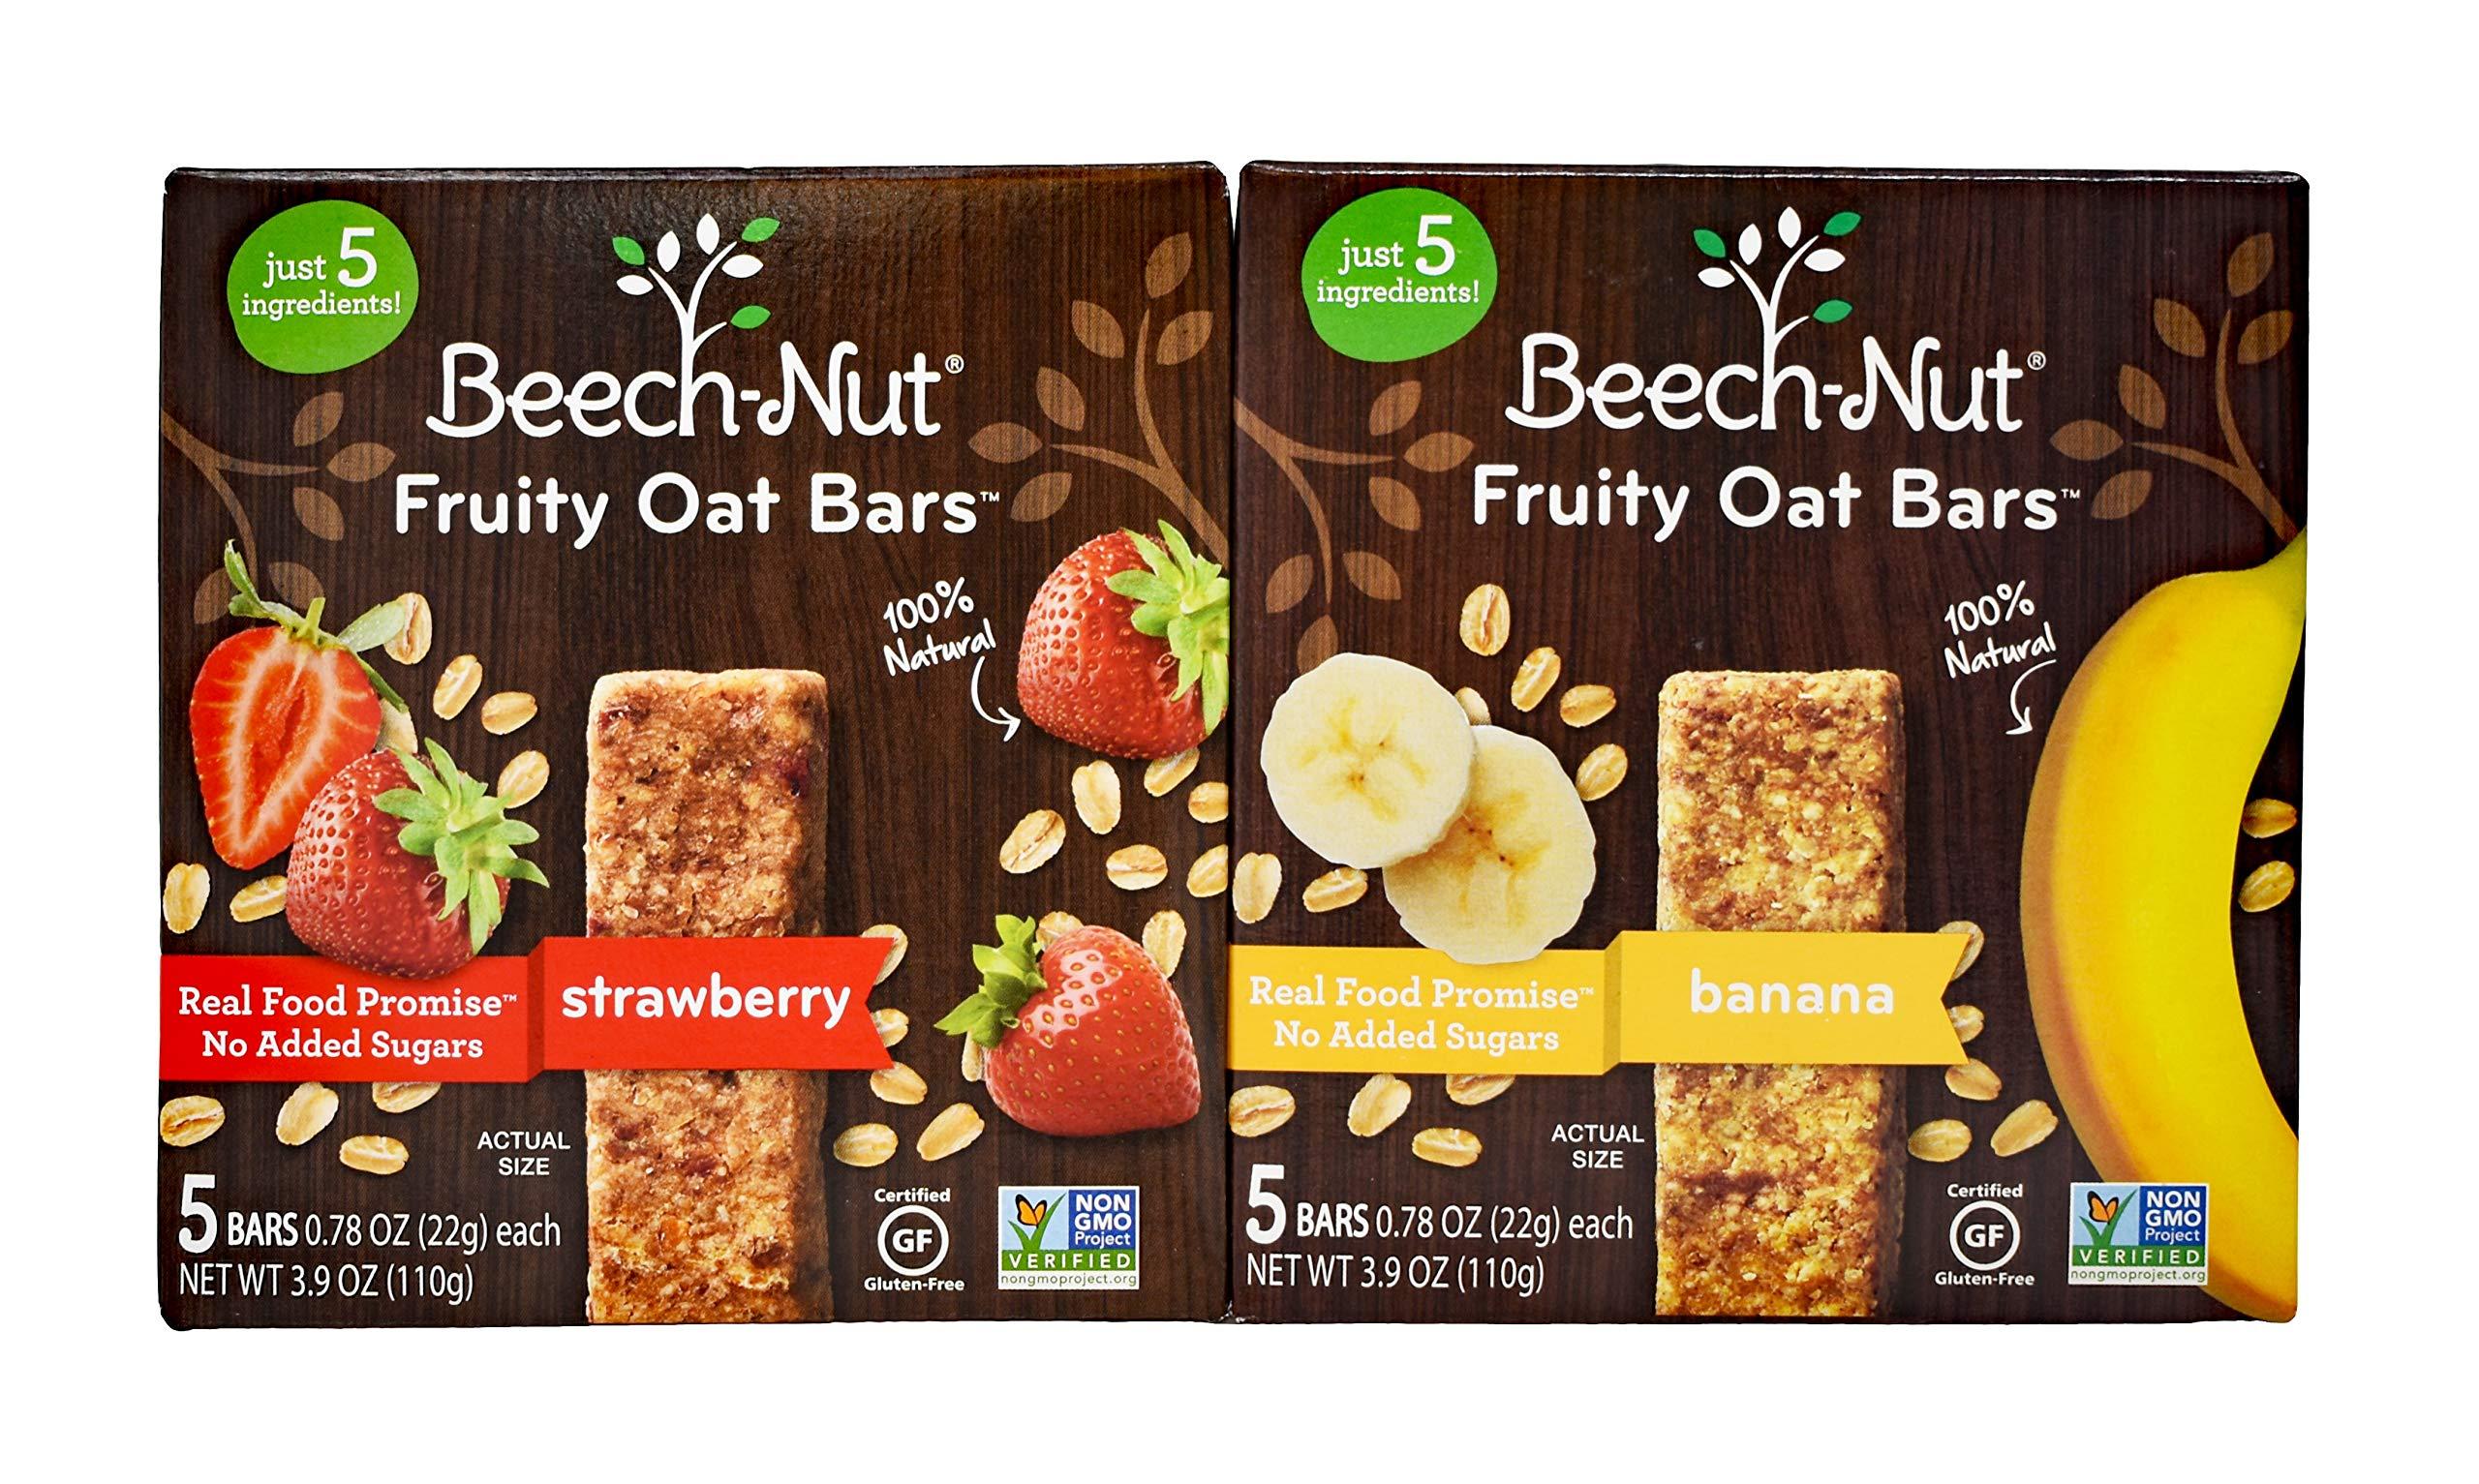 Beech-Nut Fruity Oat Bars 2 Packs. 1 Box Strawberry and 1 Box Banana 5 Bars in each Box. Plus Free Bonus 1 Pack of Baby Wipes.